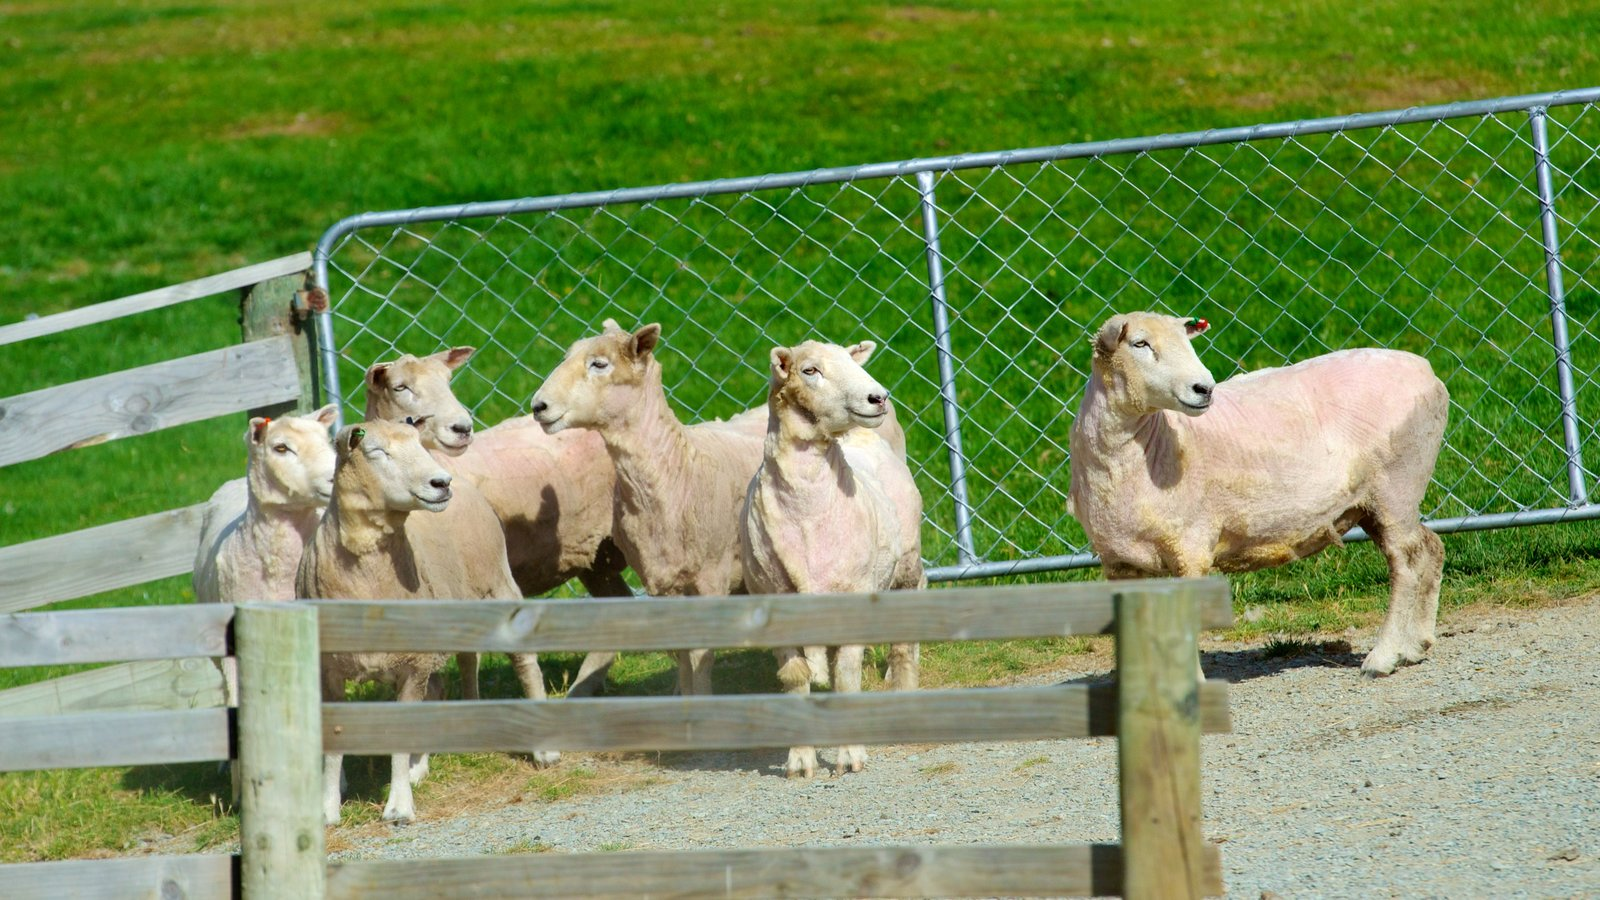 Queenstown showing animals